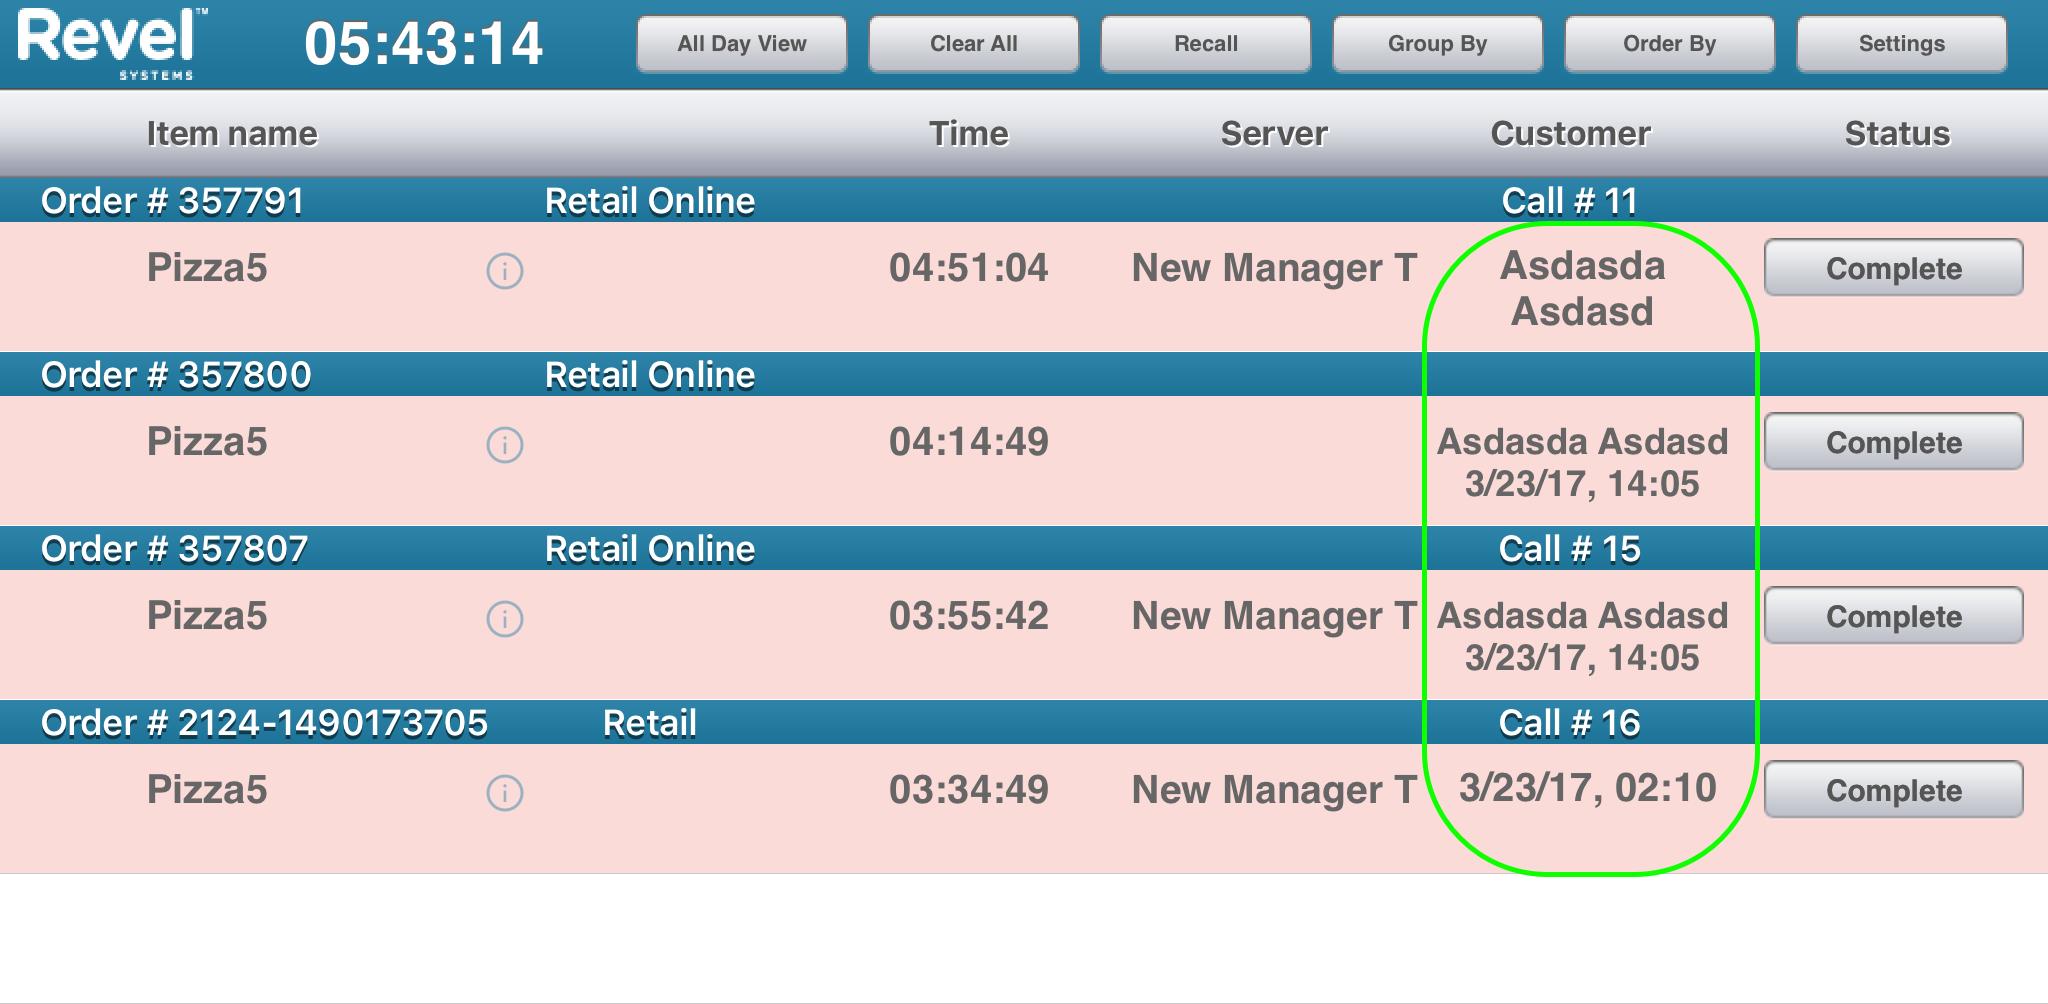 customer_pickup_time_kds1.png